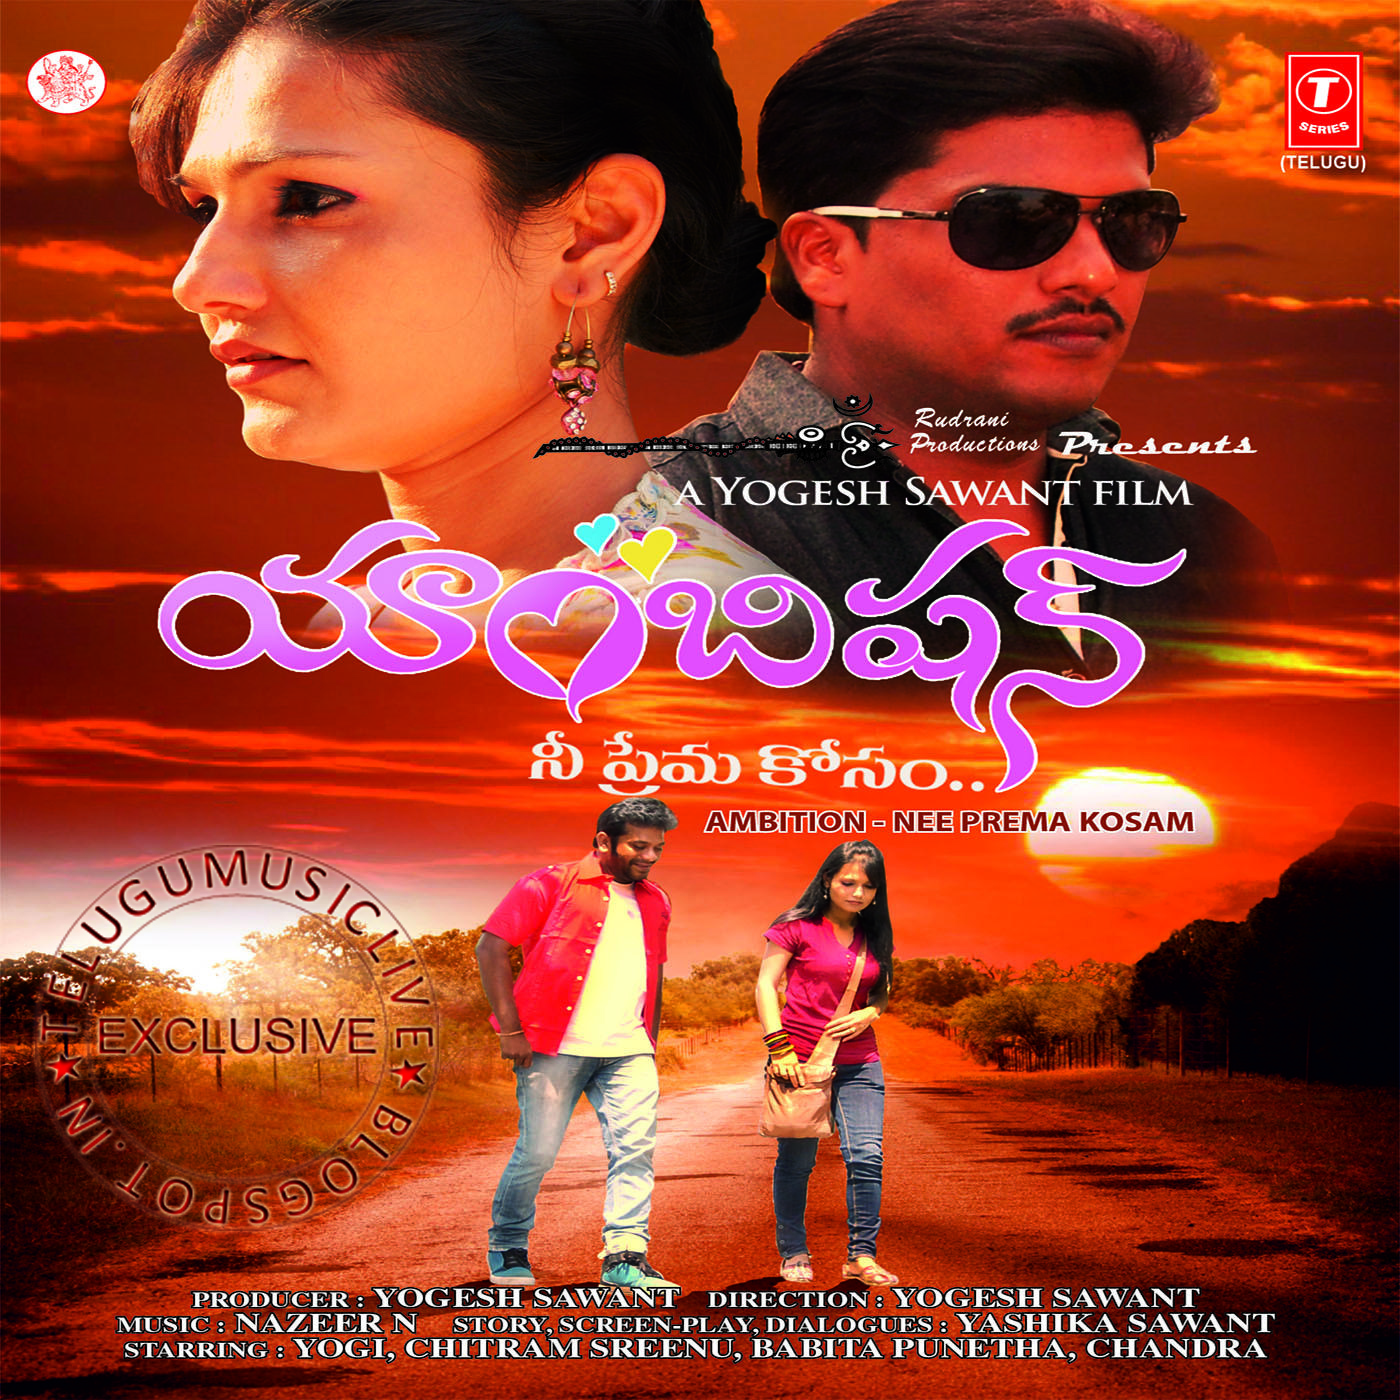 Yogi telugu movie mp3 download : Saathiya hindi film songs